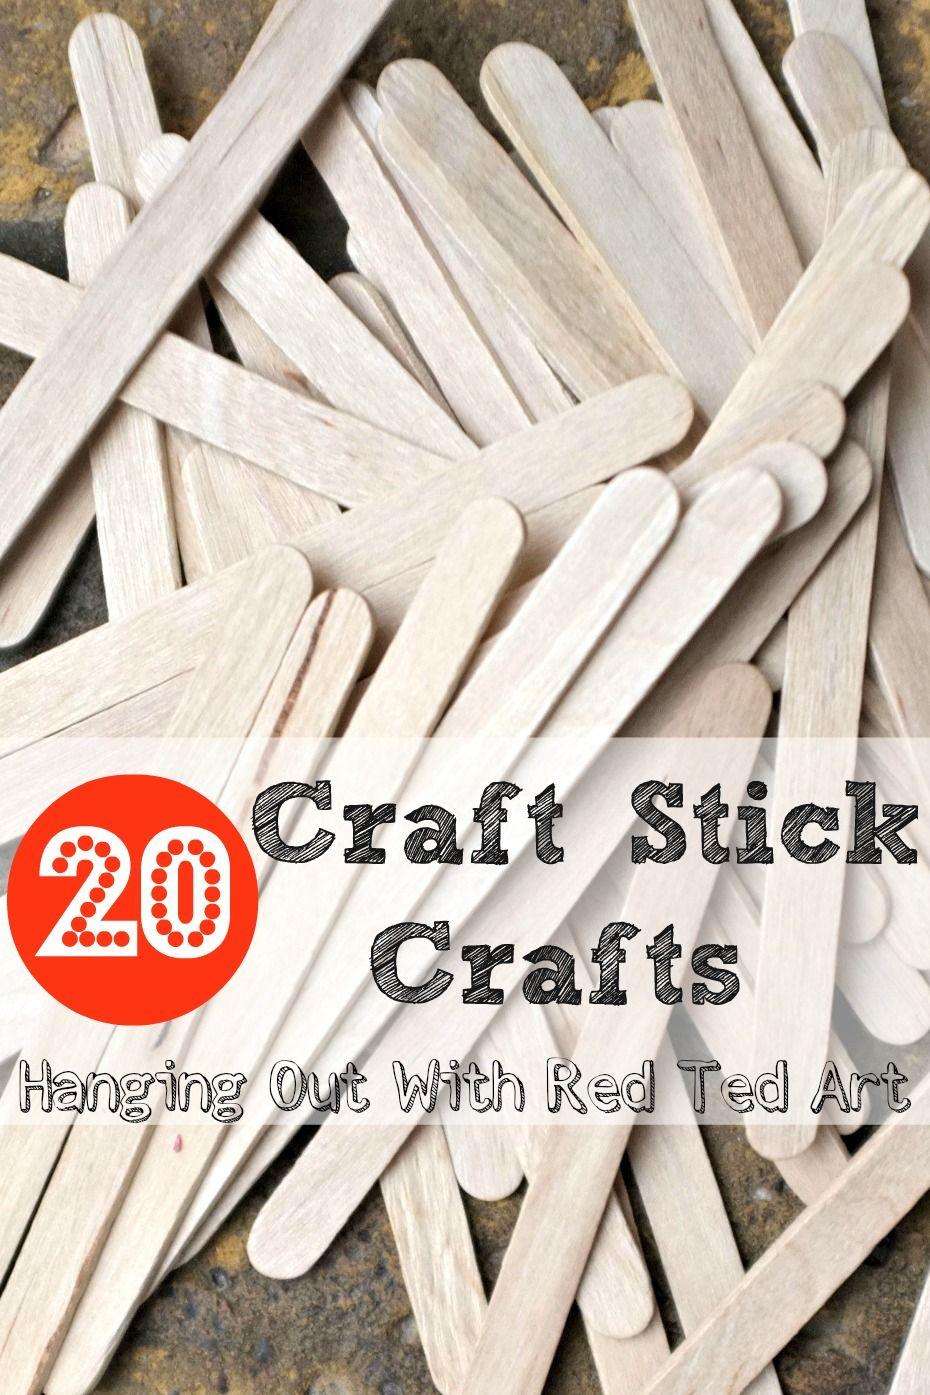 80 x Flat Coloured Wooden Lolly Sticks Lollipop Ice Art Craft